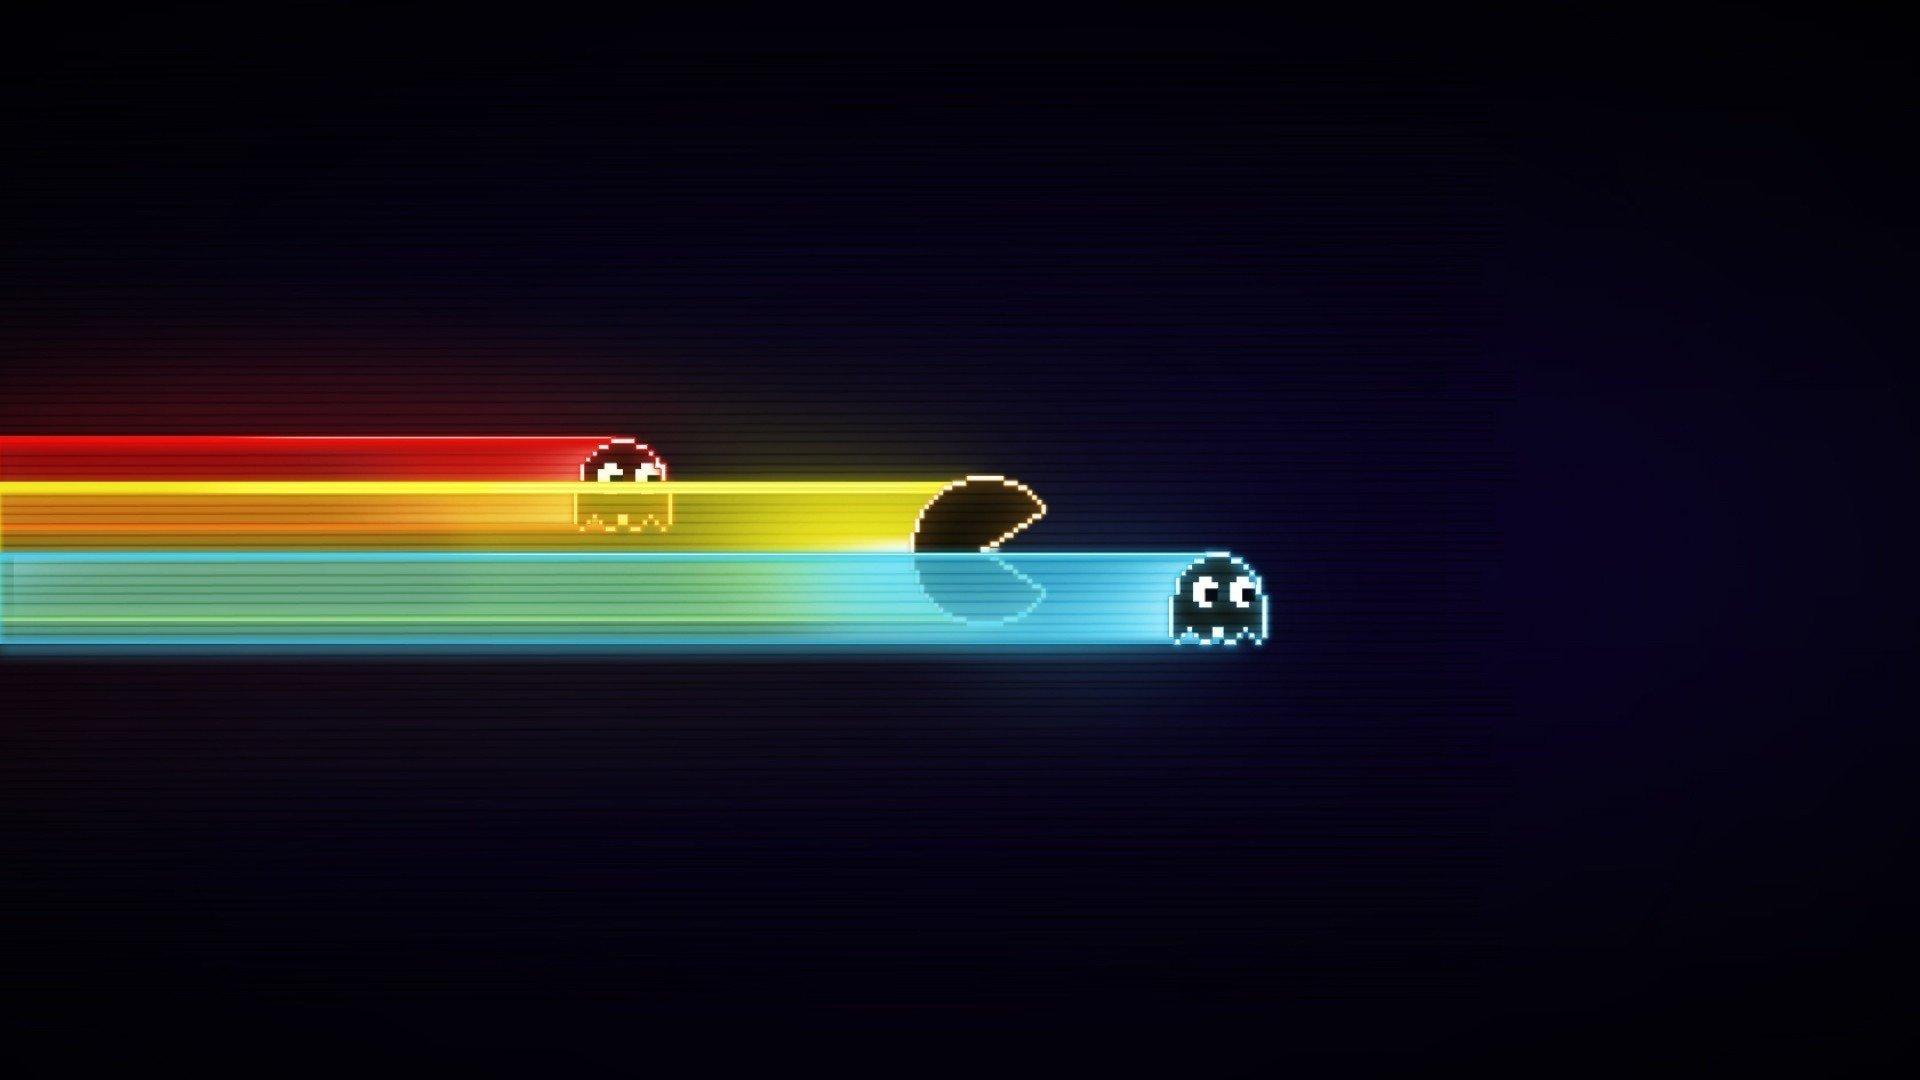 107931 Pacman GameBoy old games black minimalism